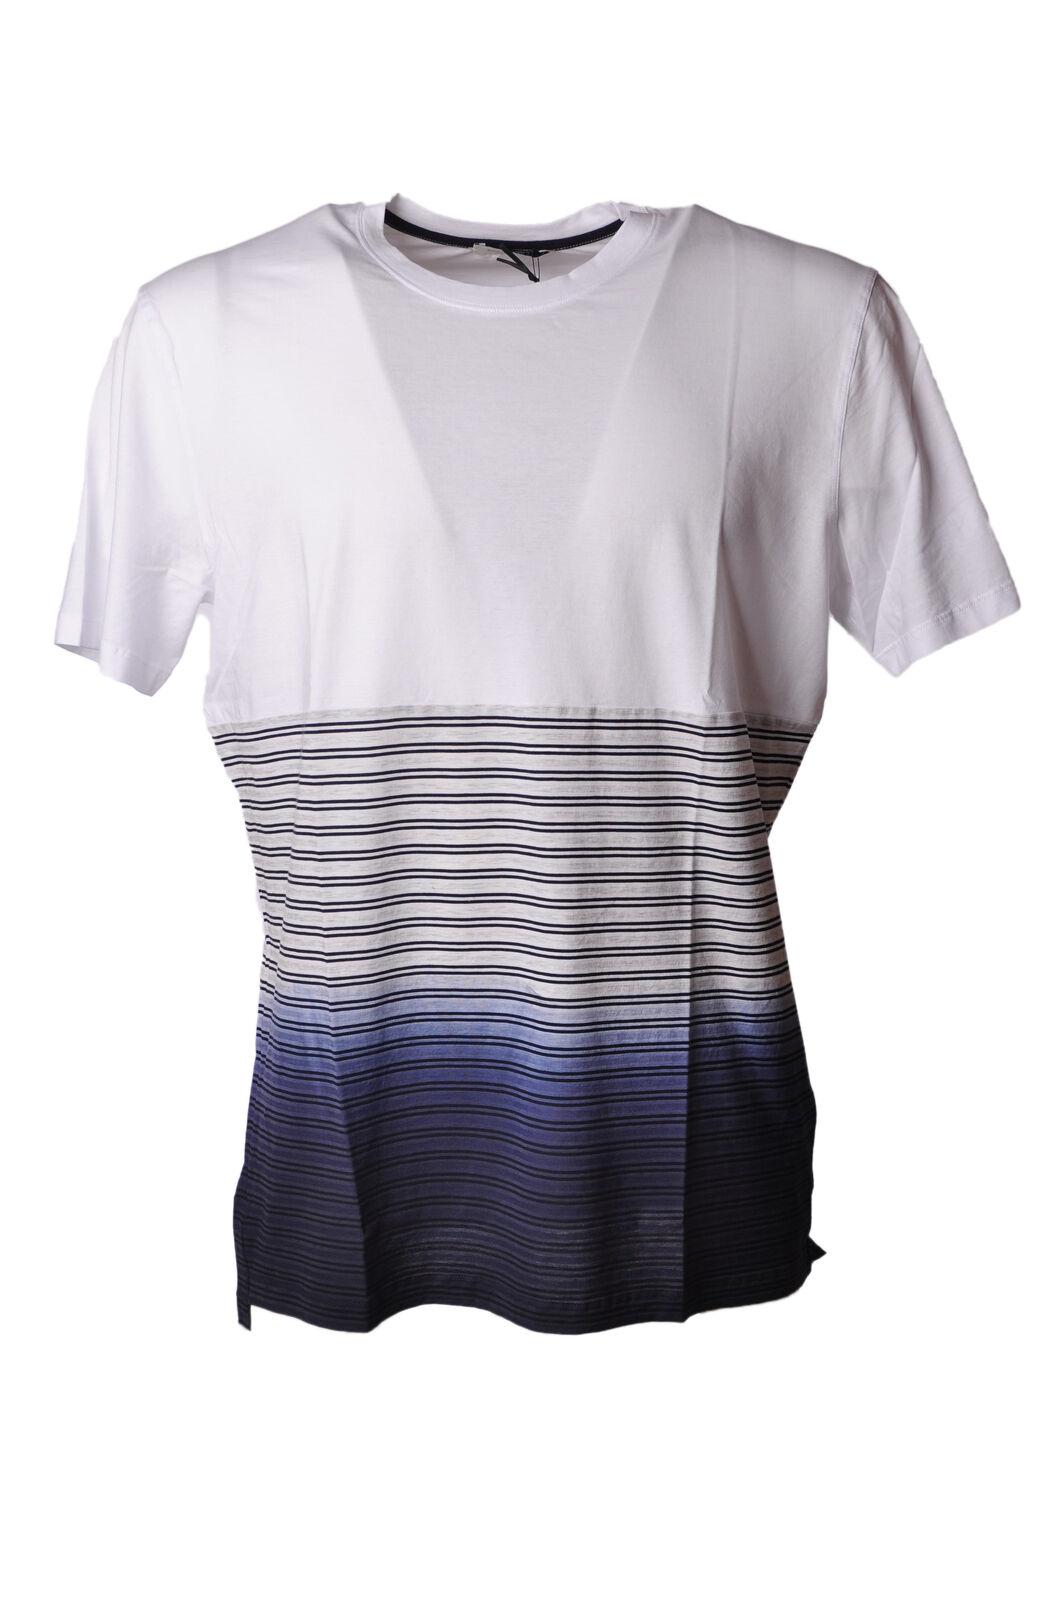 Paolo Pecora - Topwear-T-shirts - Man - Weiß - 4718004E181520